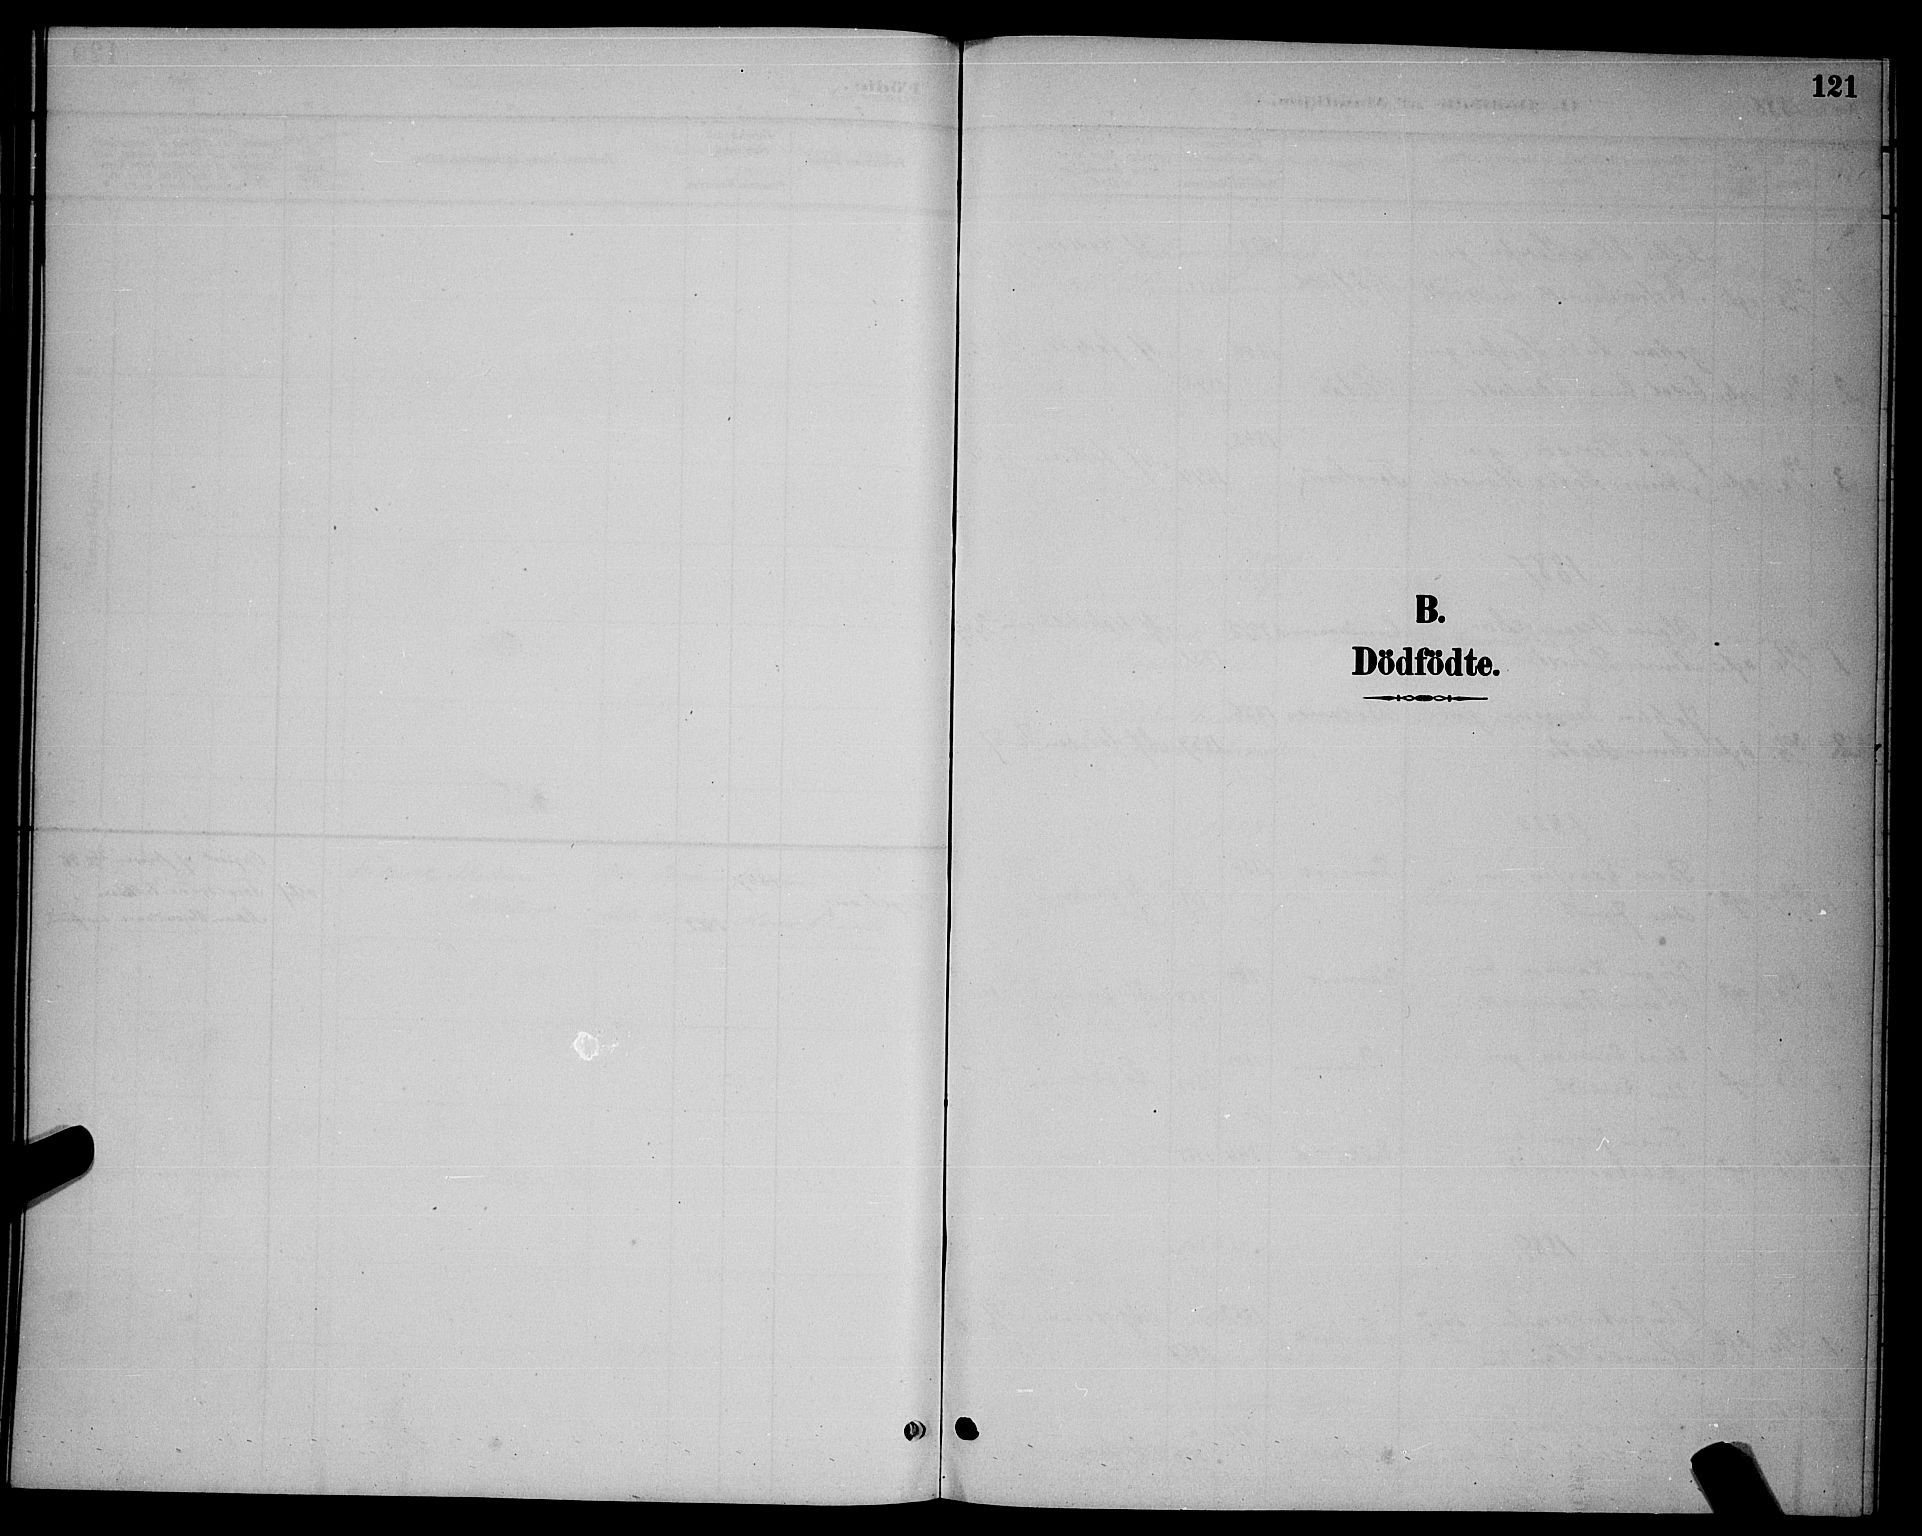 SAT, Ministerialprotokoller, klokkerbøker og fødselsregistre - Nordland, 863/L0914: Klokkerbok nr. 863C04, 1886-1897, s. 121